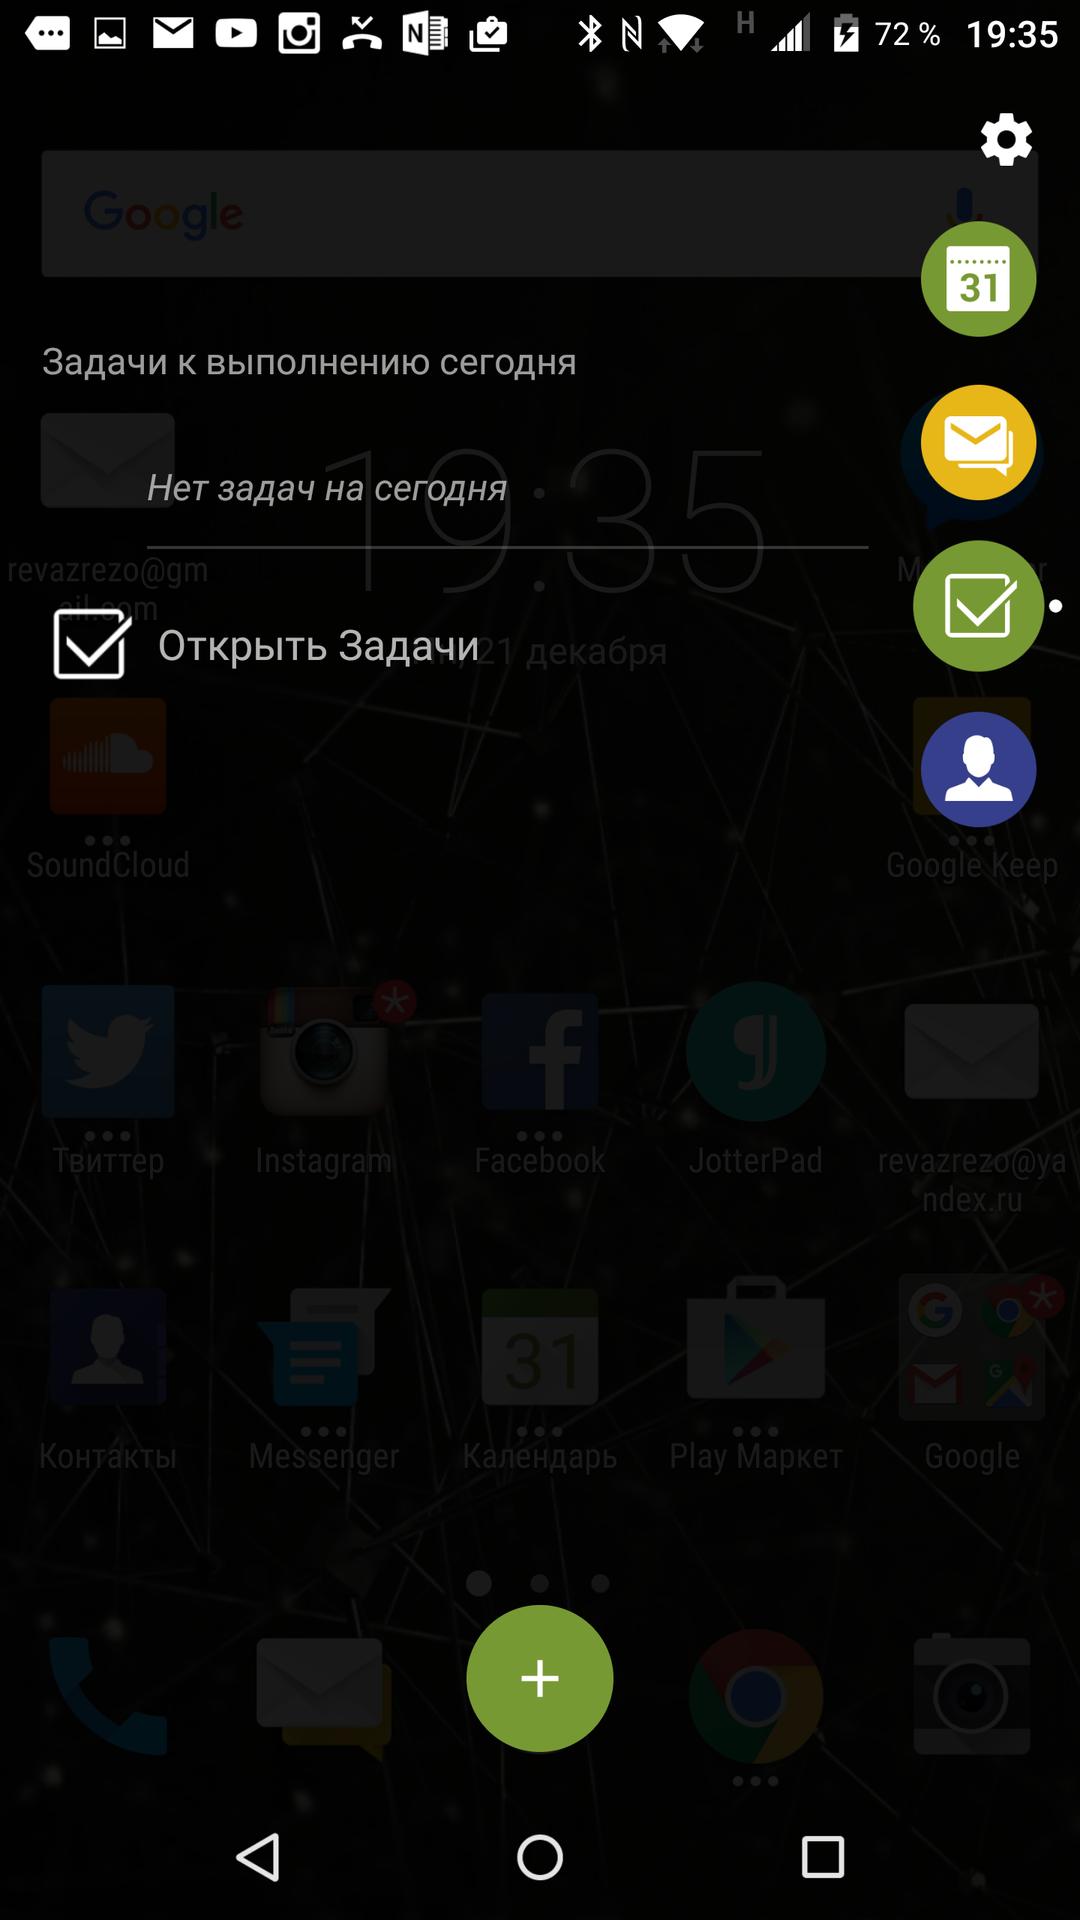 screenshot2015-12-21-19-35-16-1080x1920